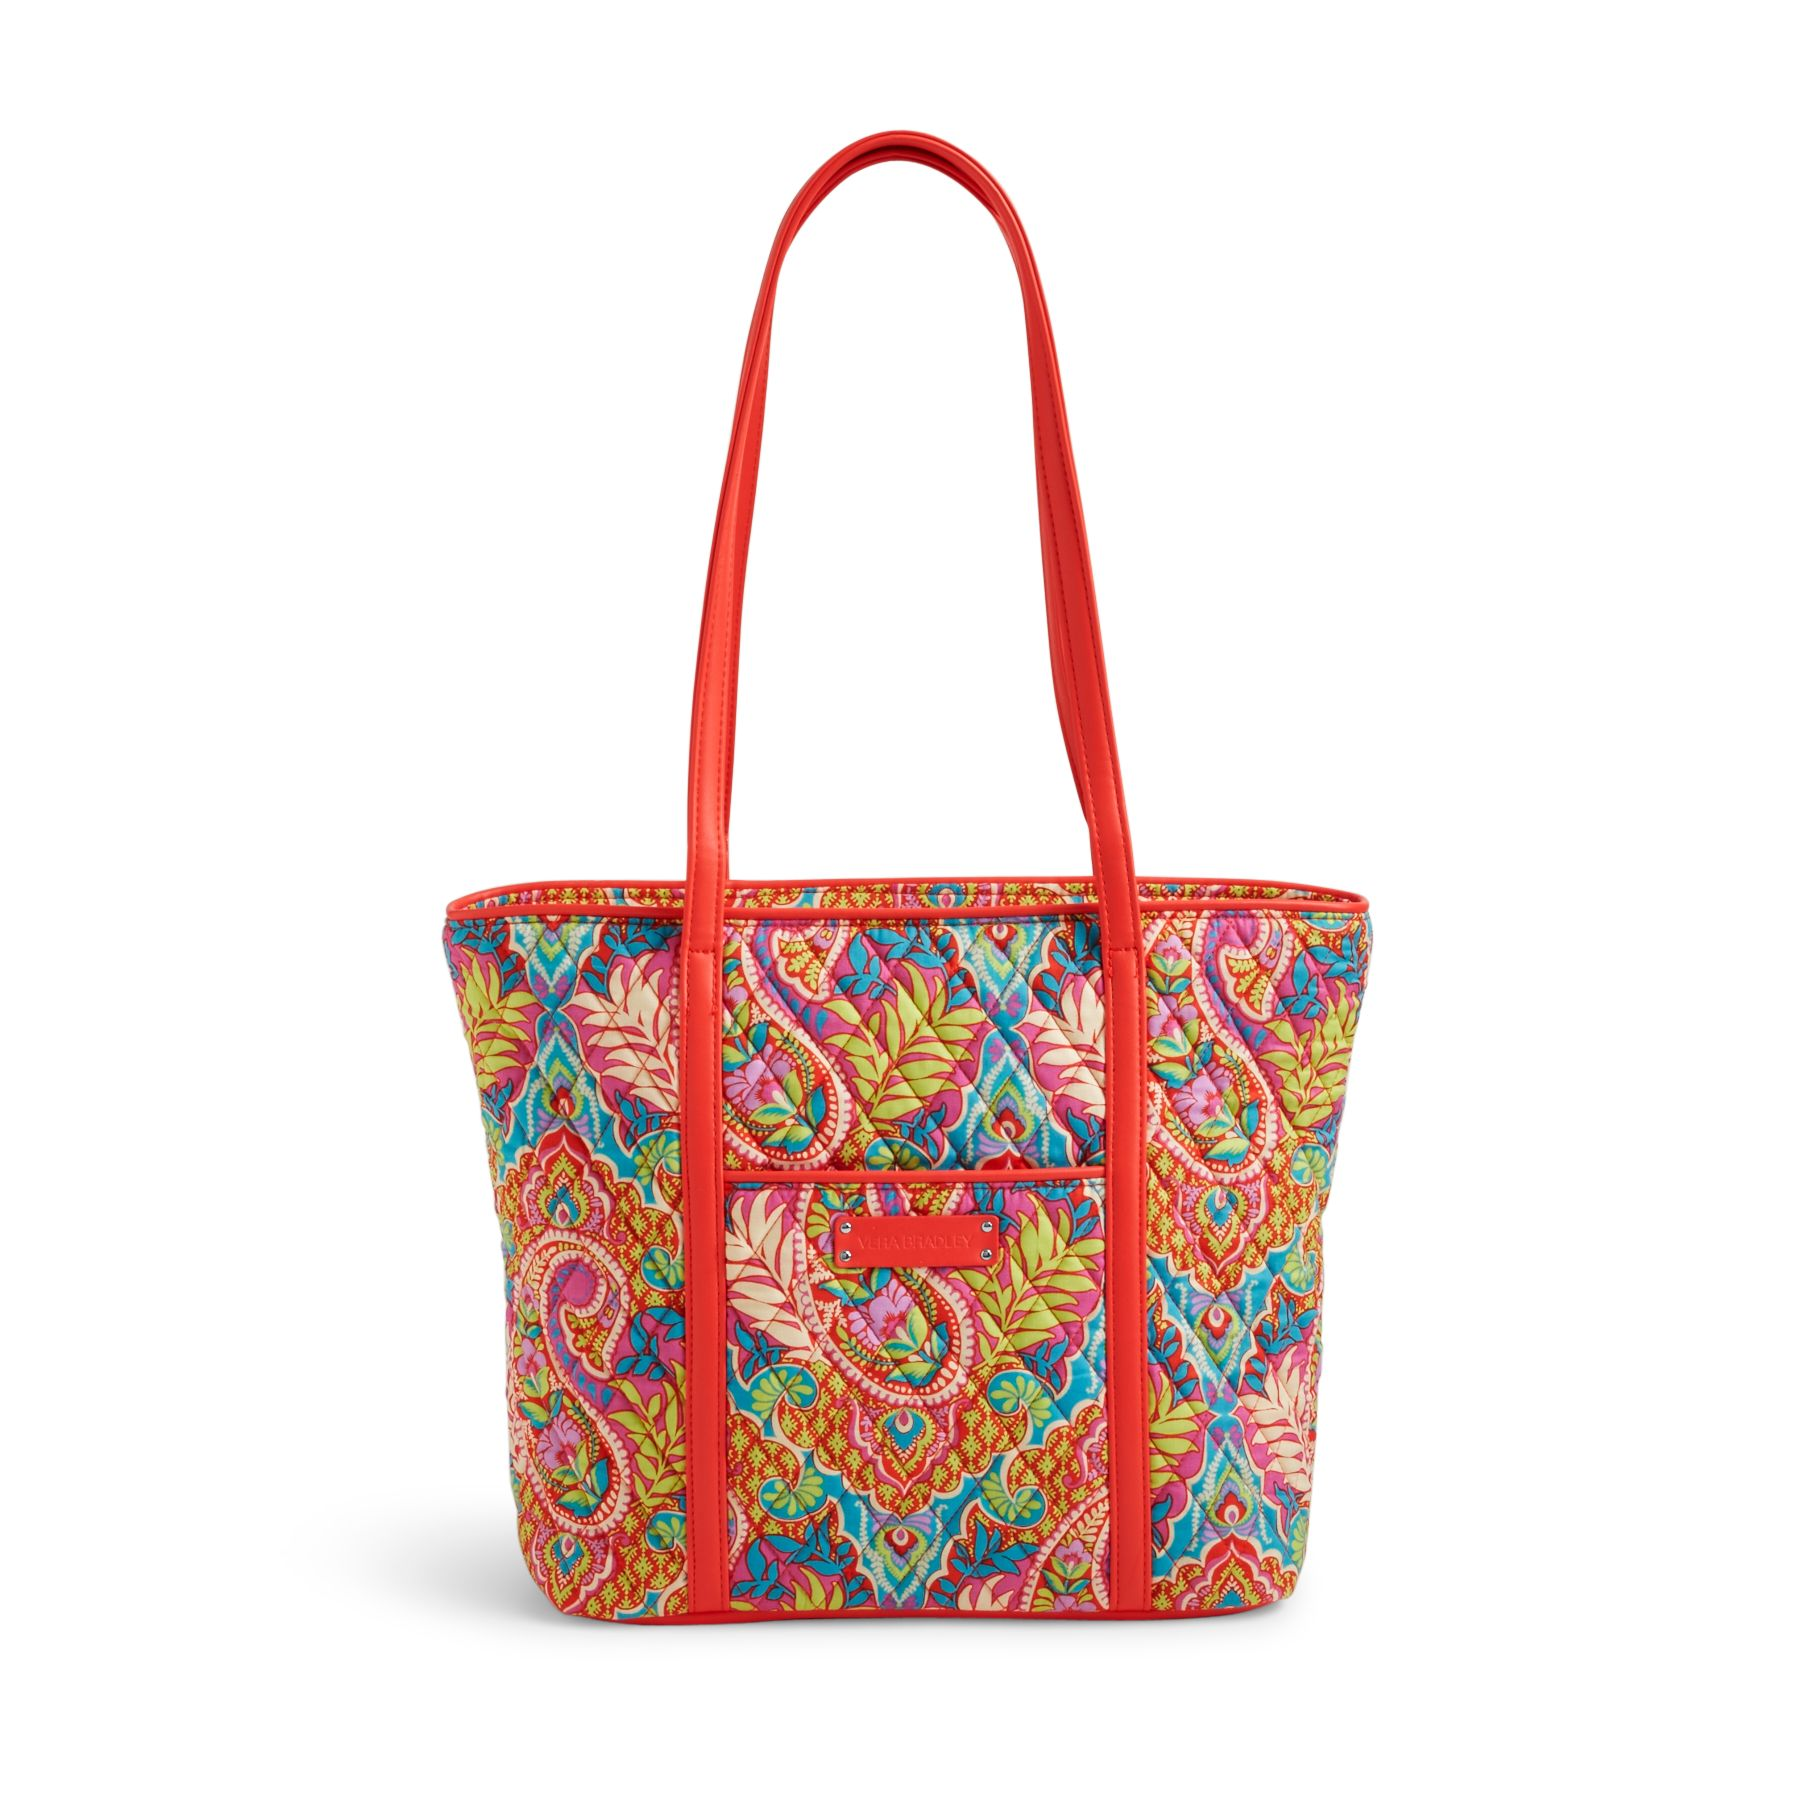 Vera Bradley Small Trimmed Vera Tote Bag | eBay